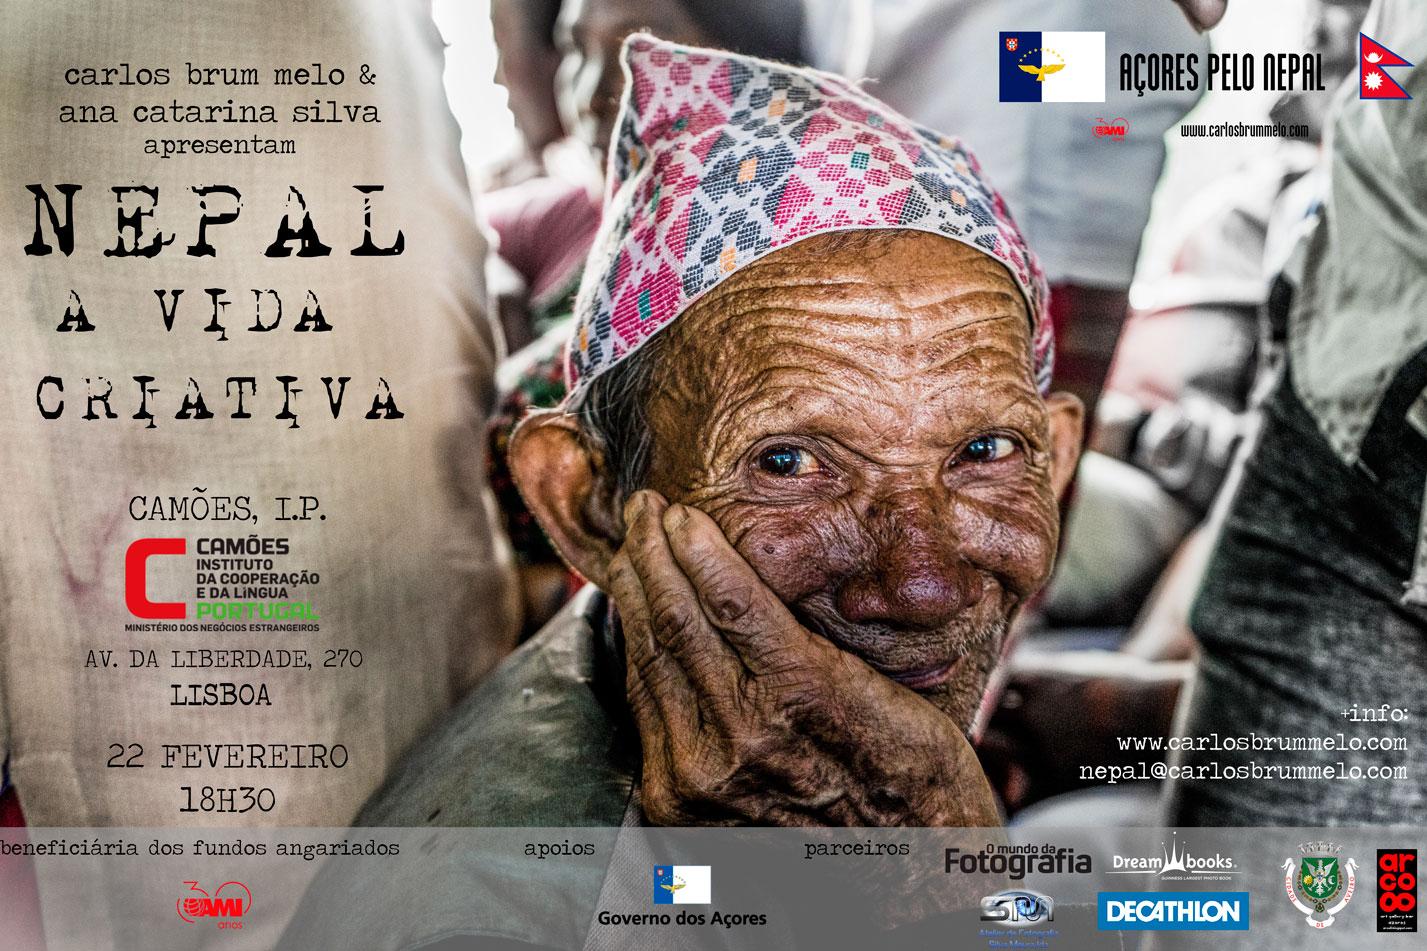 Nepal, a vida criativa (2016)